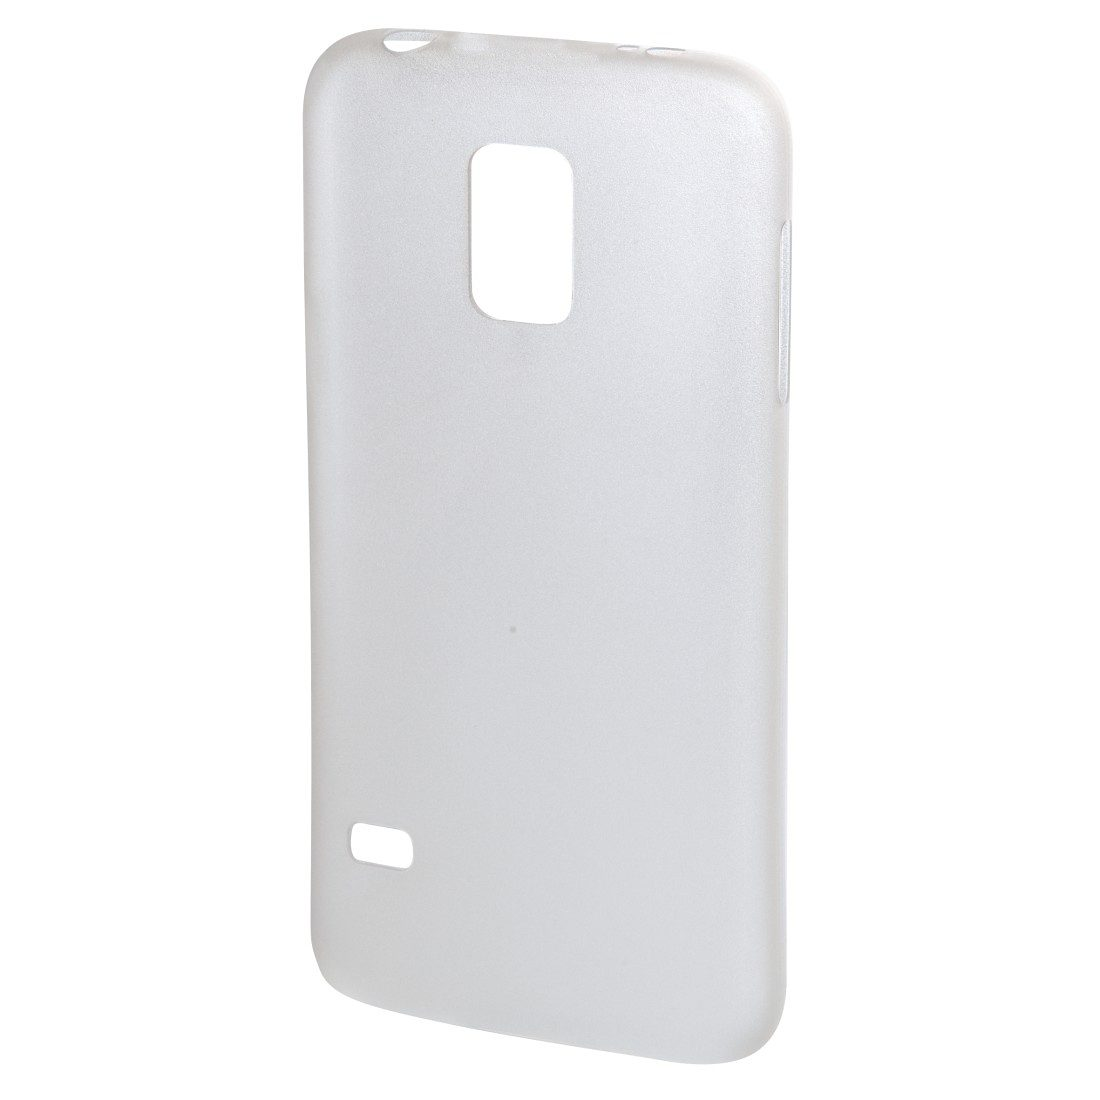 Hama Handyhülle für Samsung Galaxy S5 mini Case Schutzhülle »Handycover ultra slim«